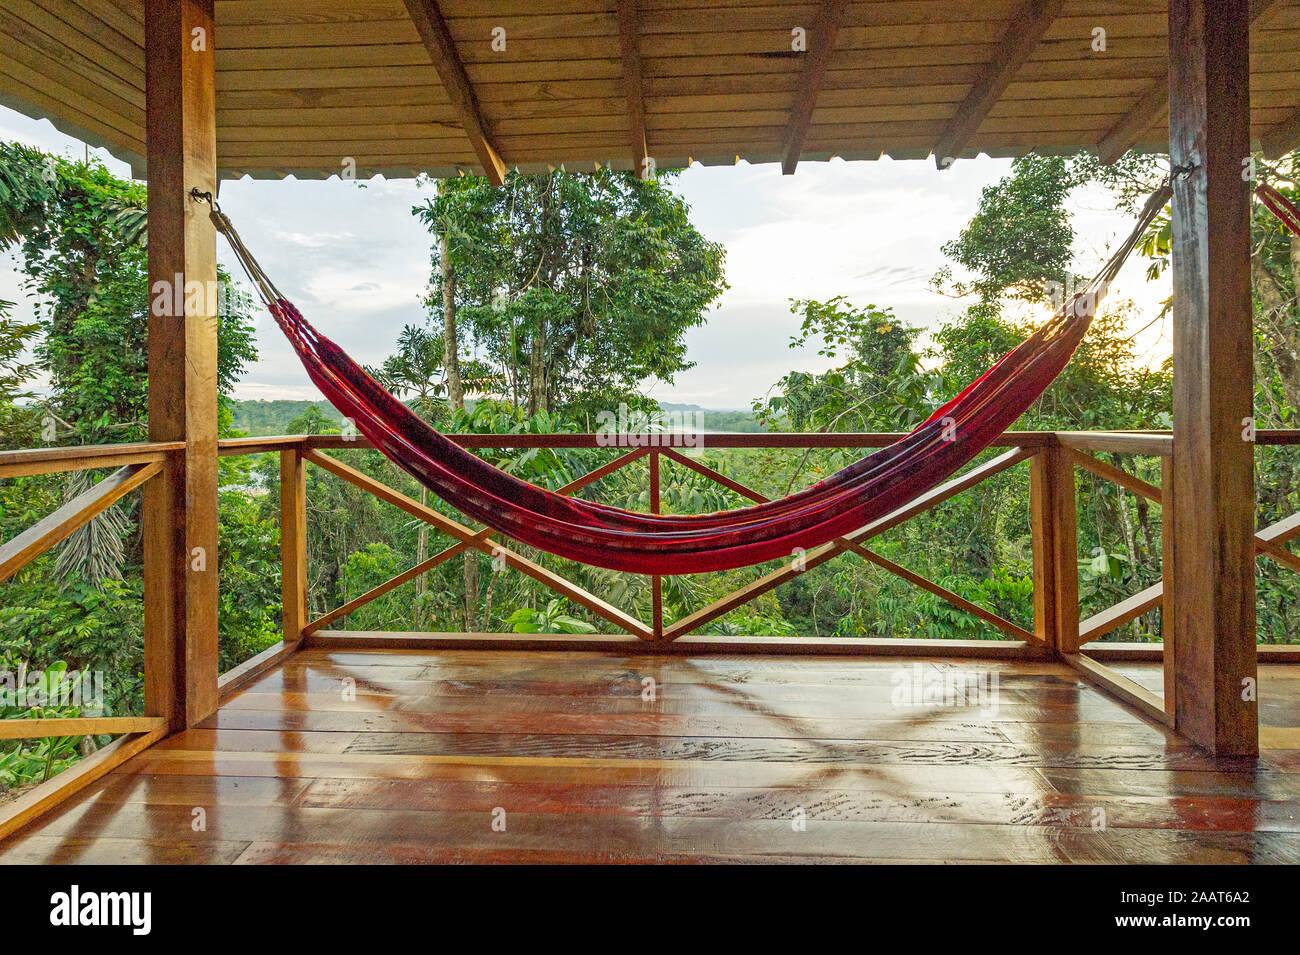 empty-hammock-swinging-at-a-tourist-cabin-in-the-amazone-jungle-2AAT6A2.jpg